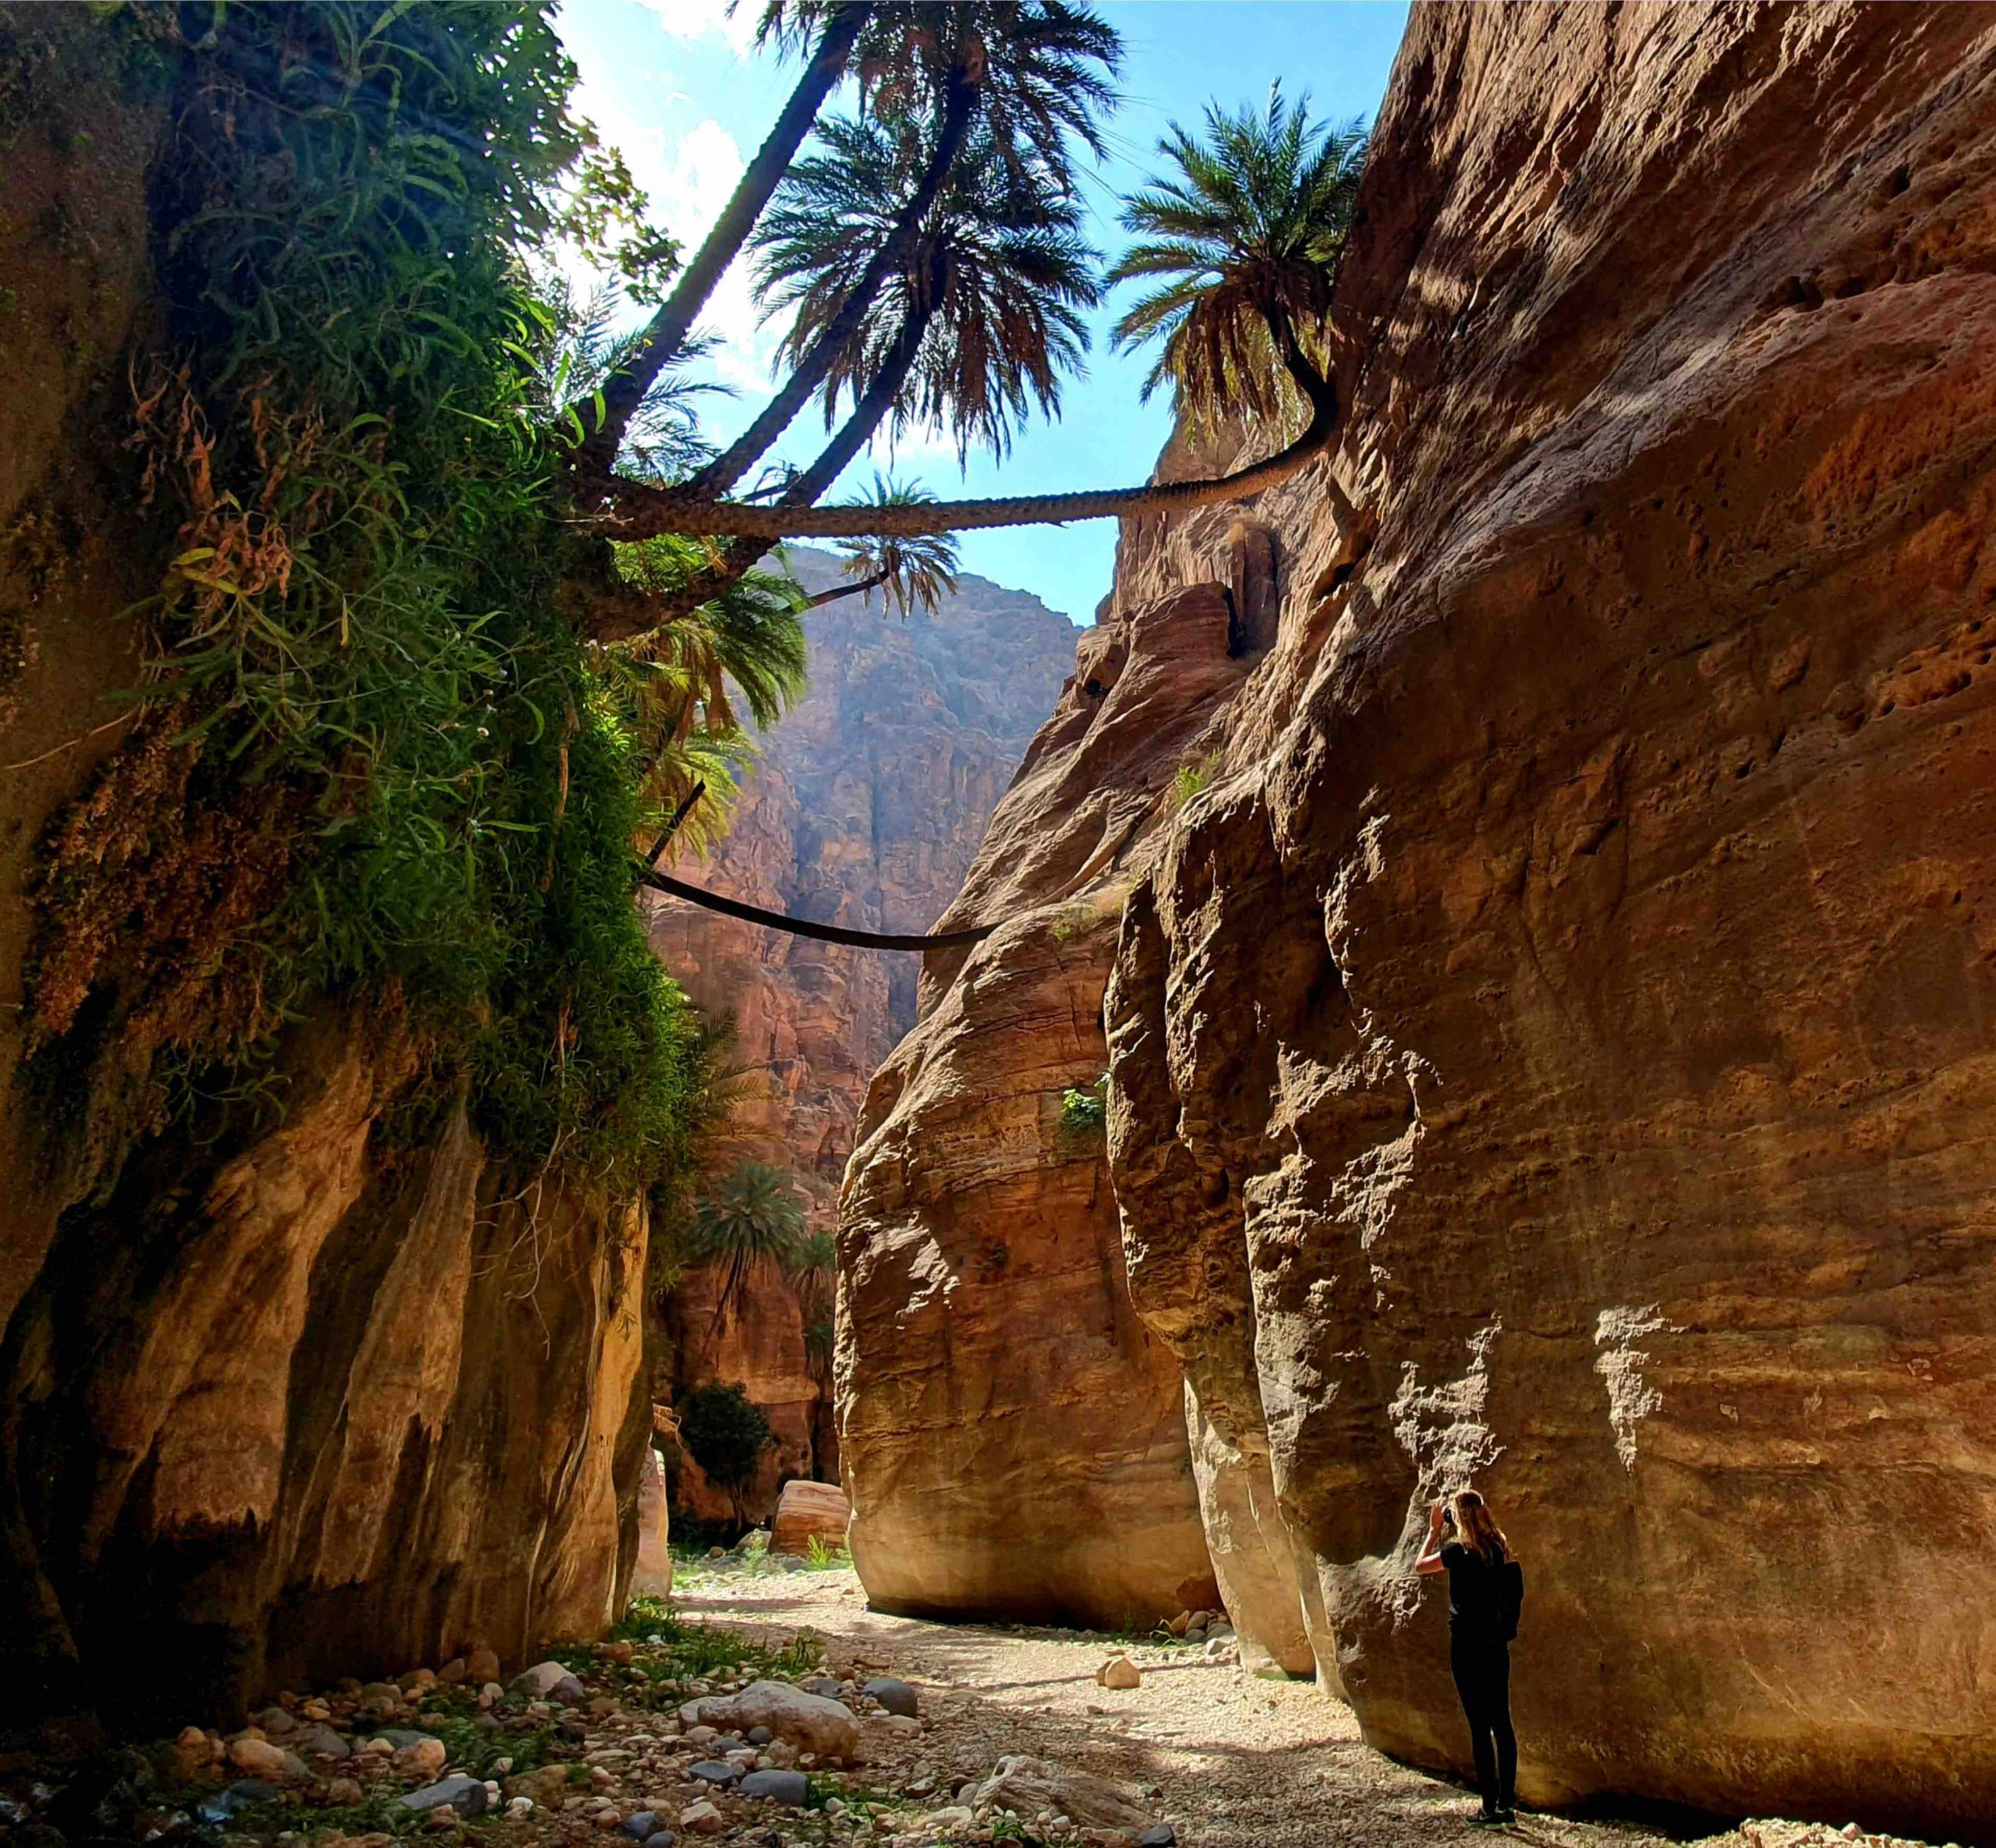 Lustrumreis Jordanië met de Lustrumguru